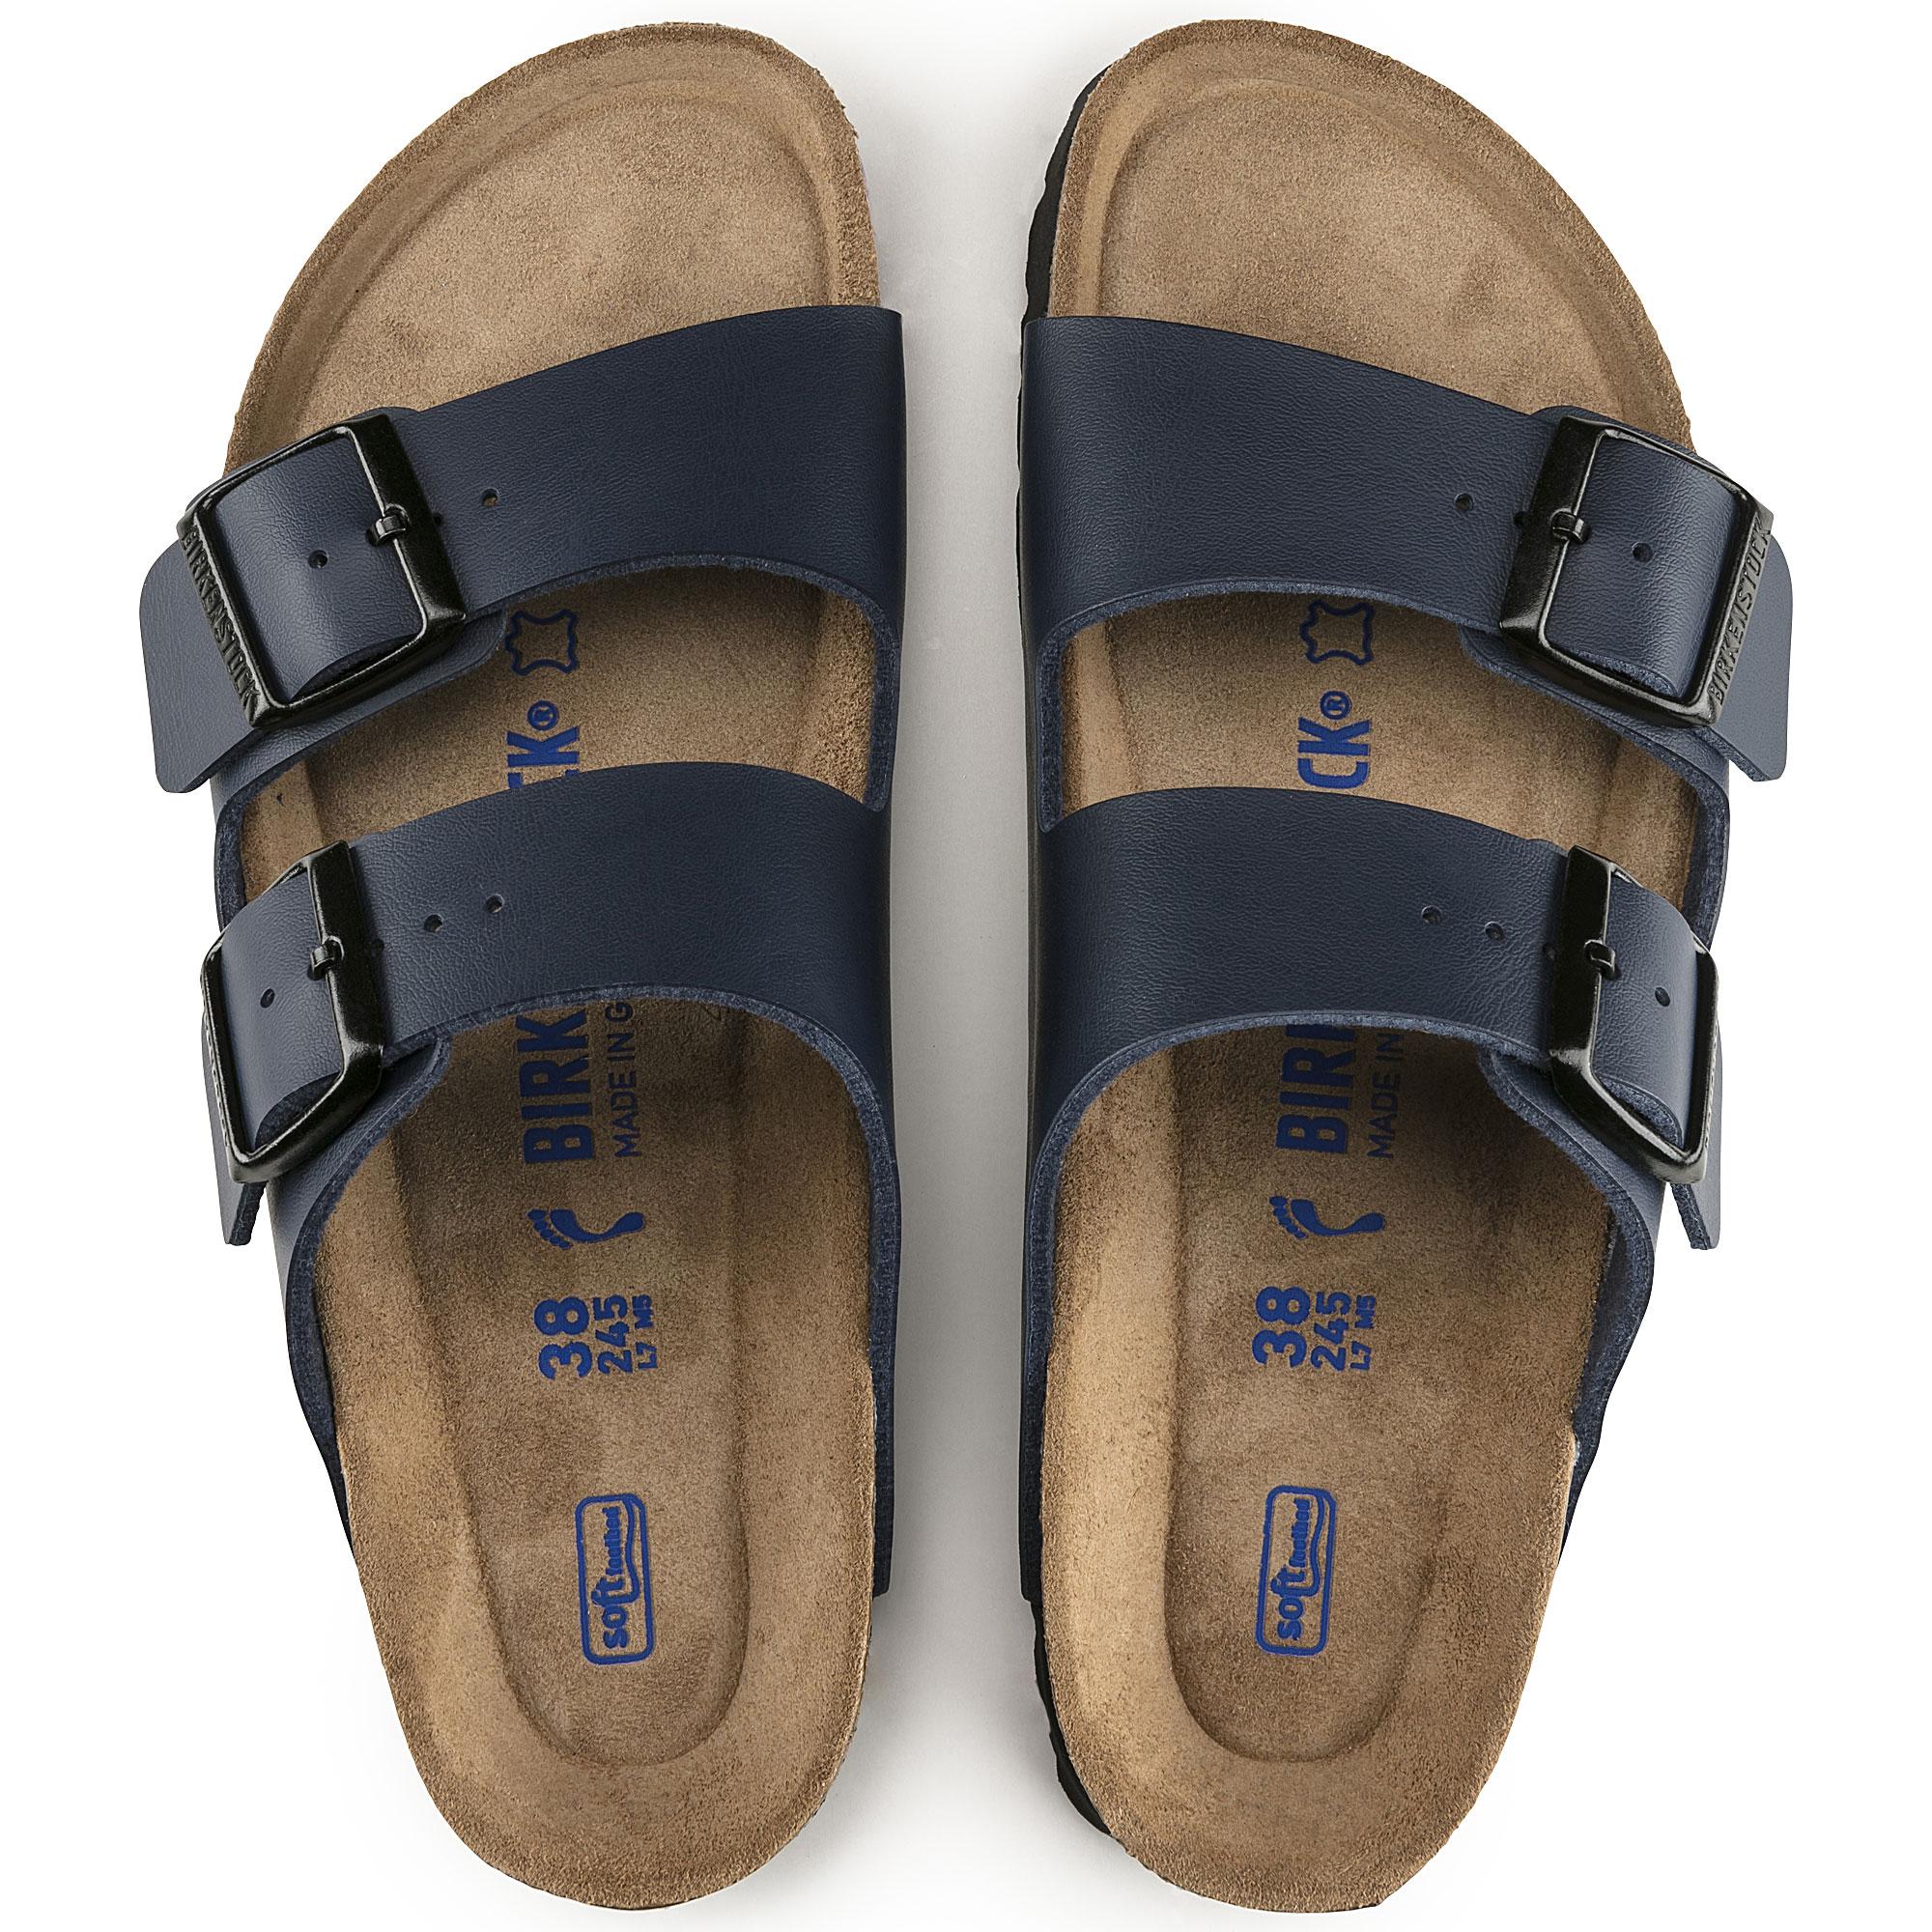 82c4ba2c2e44 Arizona Birko-Flor Blue | shop online at BIRKENSTOCK